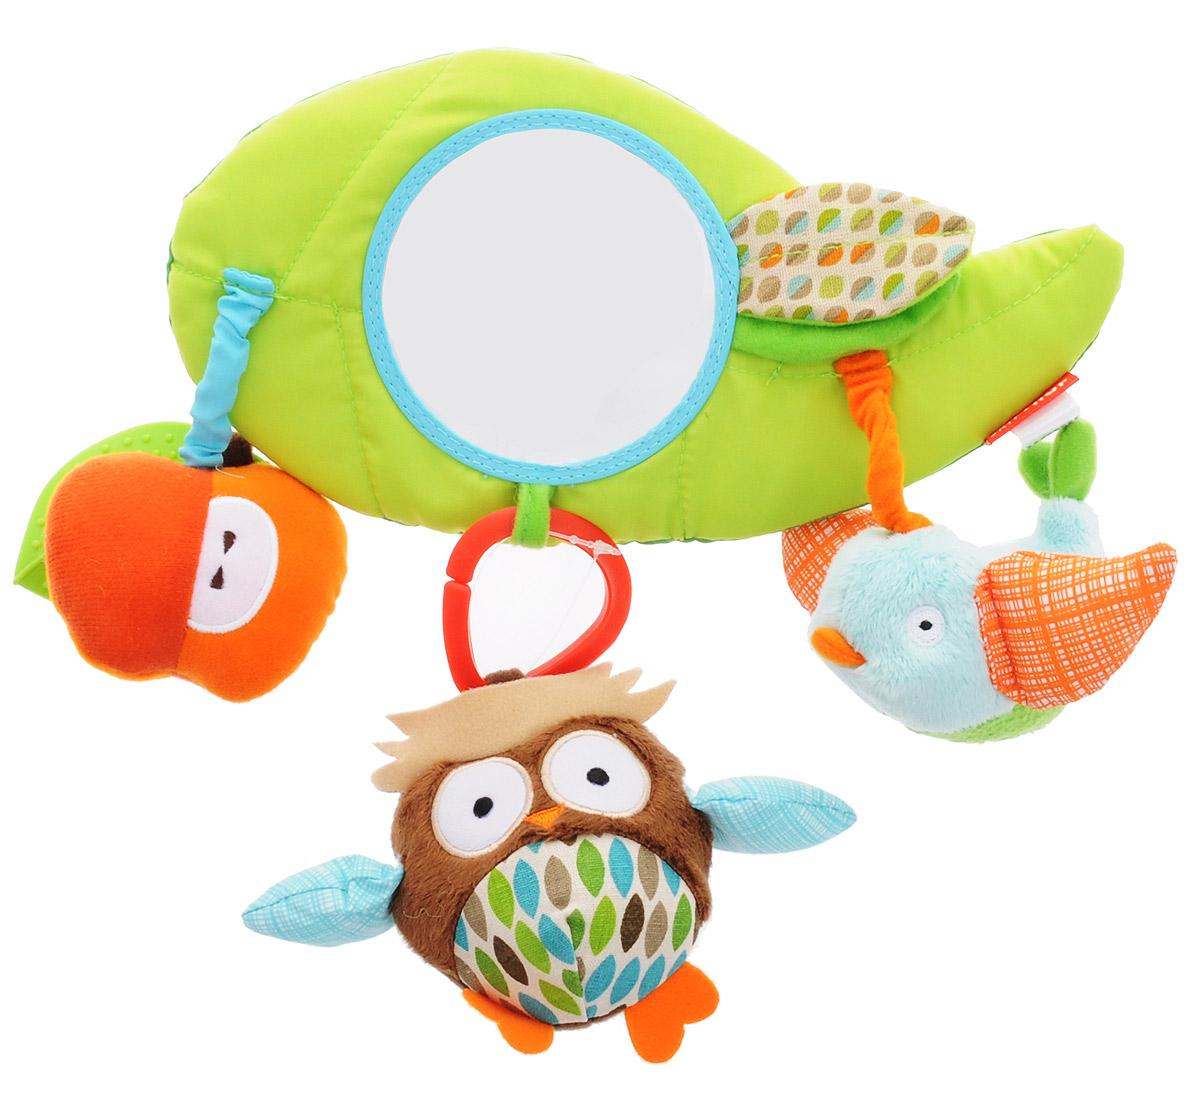 Skip Hop Развивающая игрушка-подвеска на коляску Друзья б у коляску геоби катарина на авито